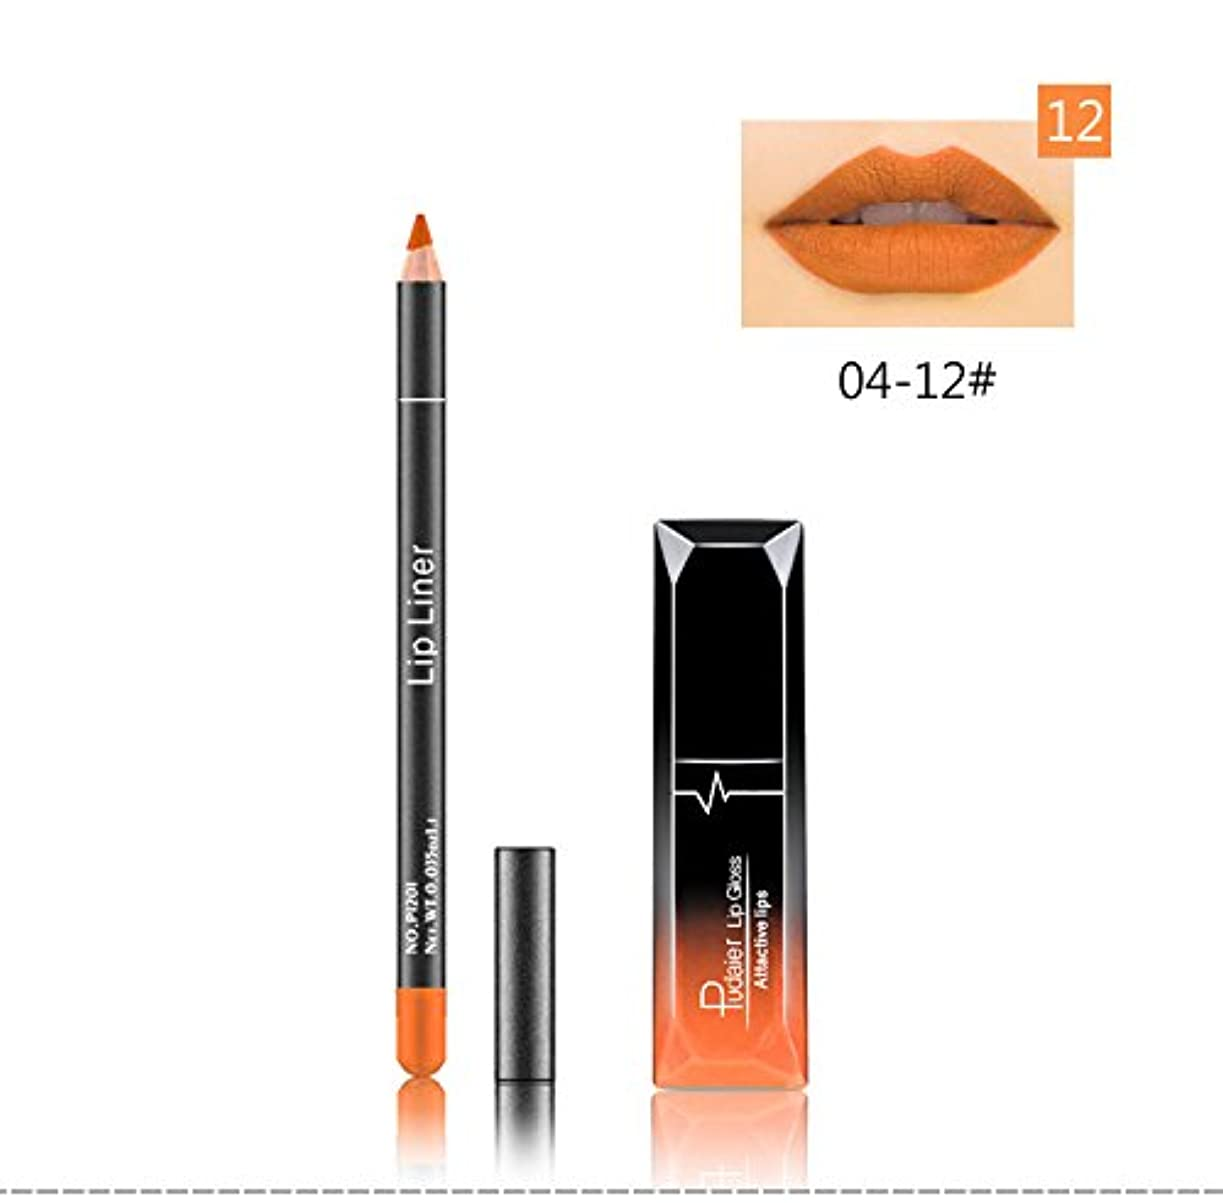 電極出版小説(12) Pudaier 1pc Matte Liquid Lipstick Cosmetic Lip Kit+ 1 Pc Nude Lip Liner Pencil MakeUp Set Waterproof Long Lasting Lipstick Gfit